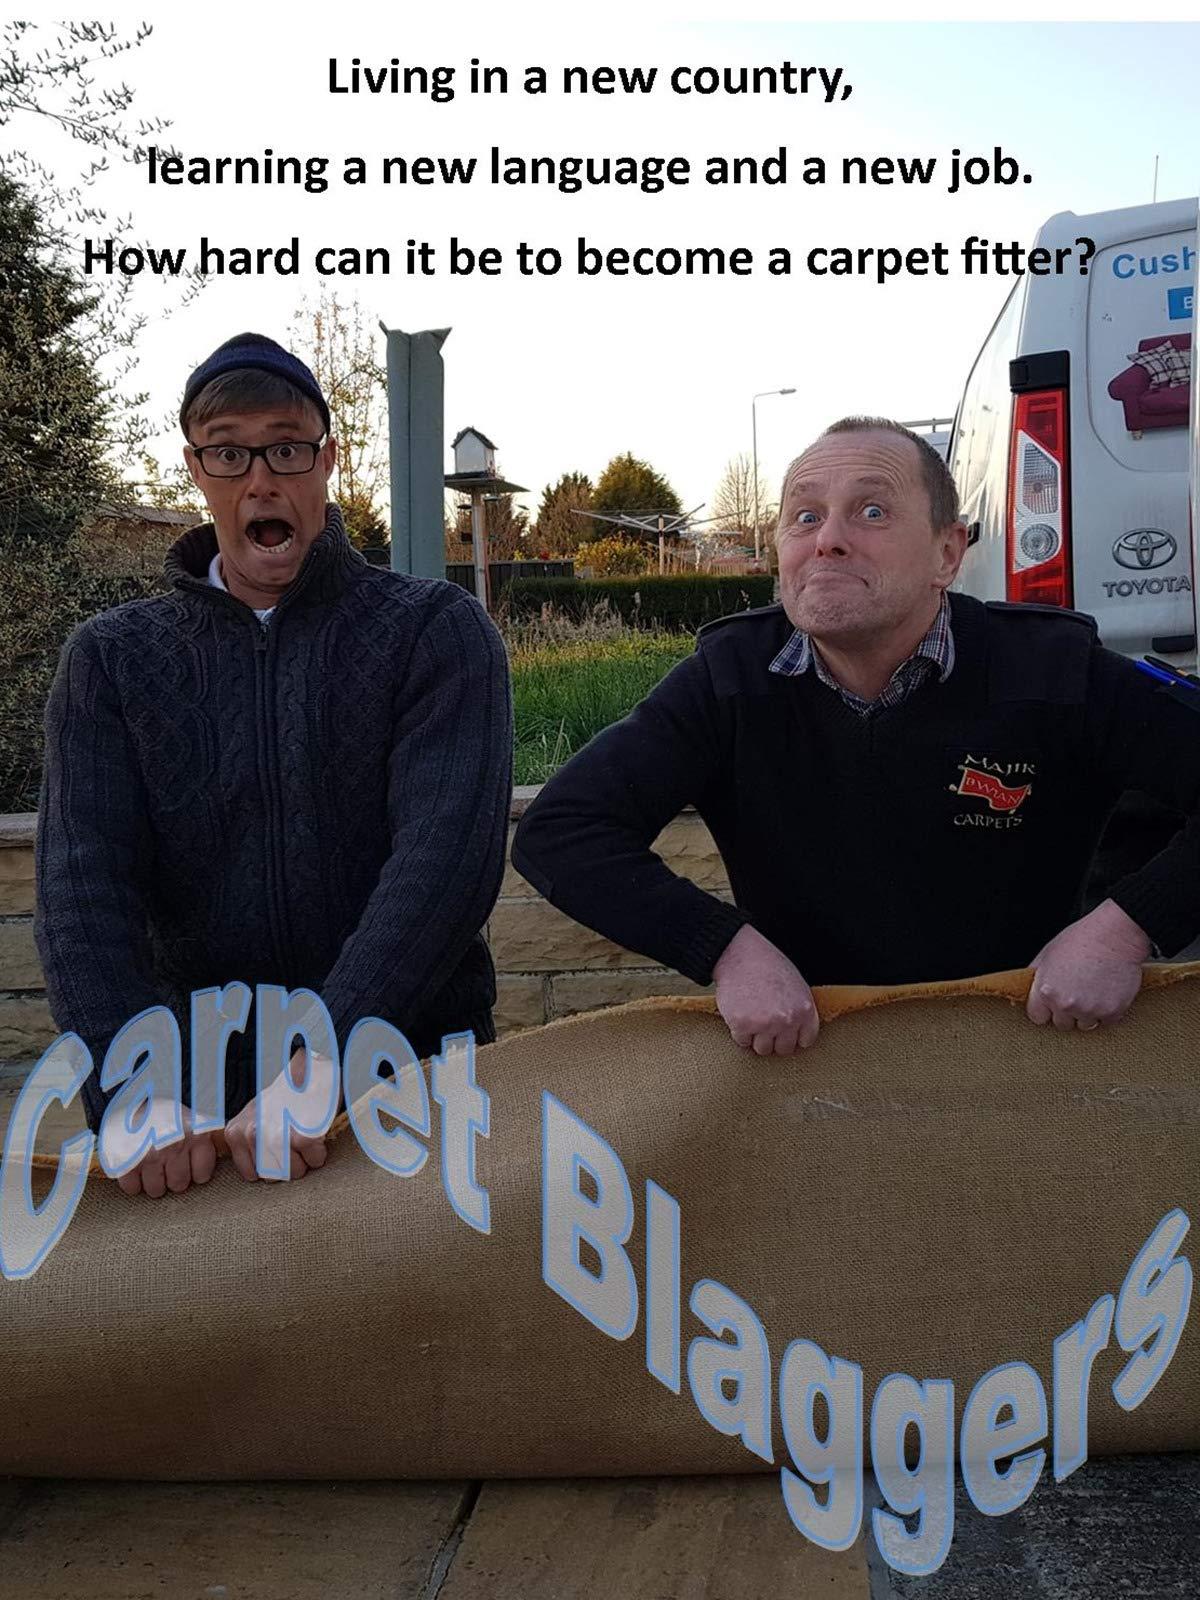 Carpet Blaggers